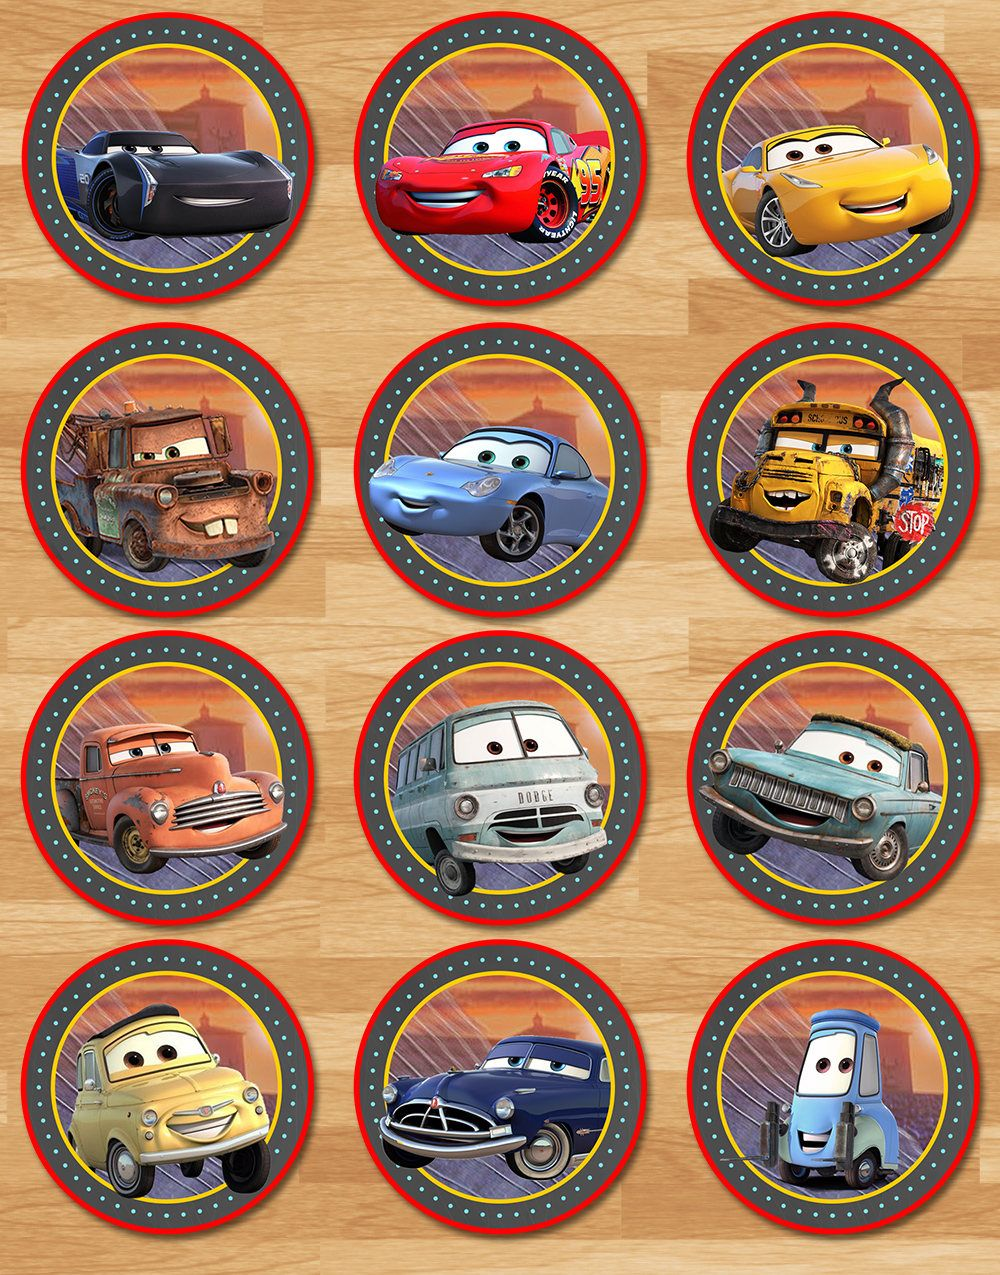 Disney Cars 3 Cupcake Toppers Chalkboard Cars 3 Stickers Etsy Decoracao De Festa Infantil Tema Carros Festa Tematica De Carros Carros Da Disney [ 1275 x 1000 Pixel ]